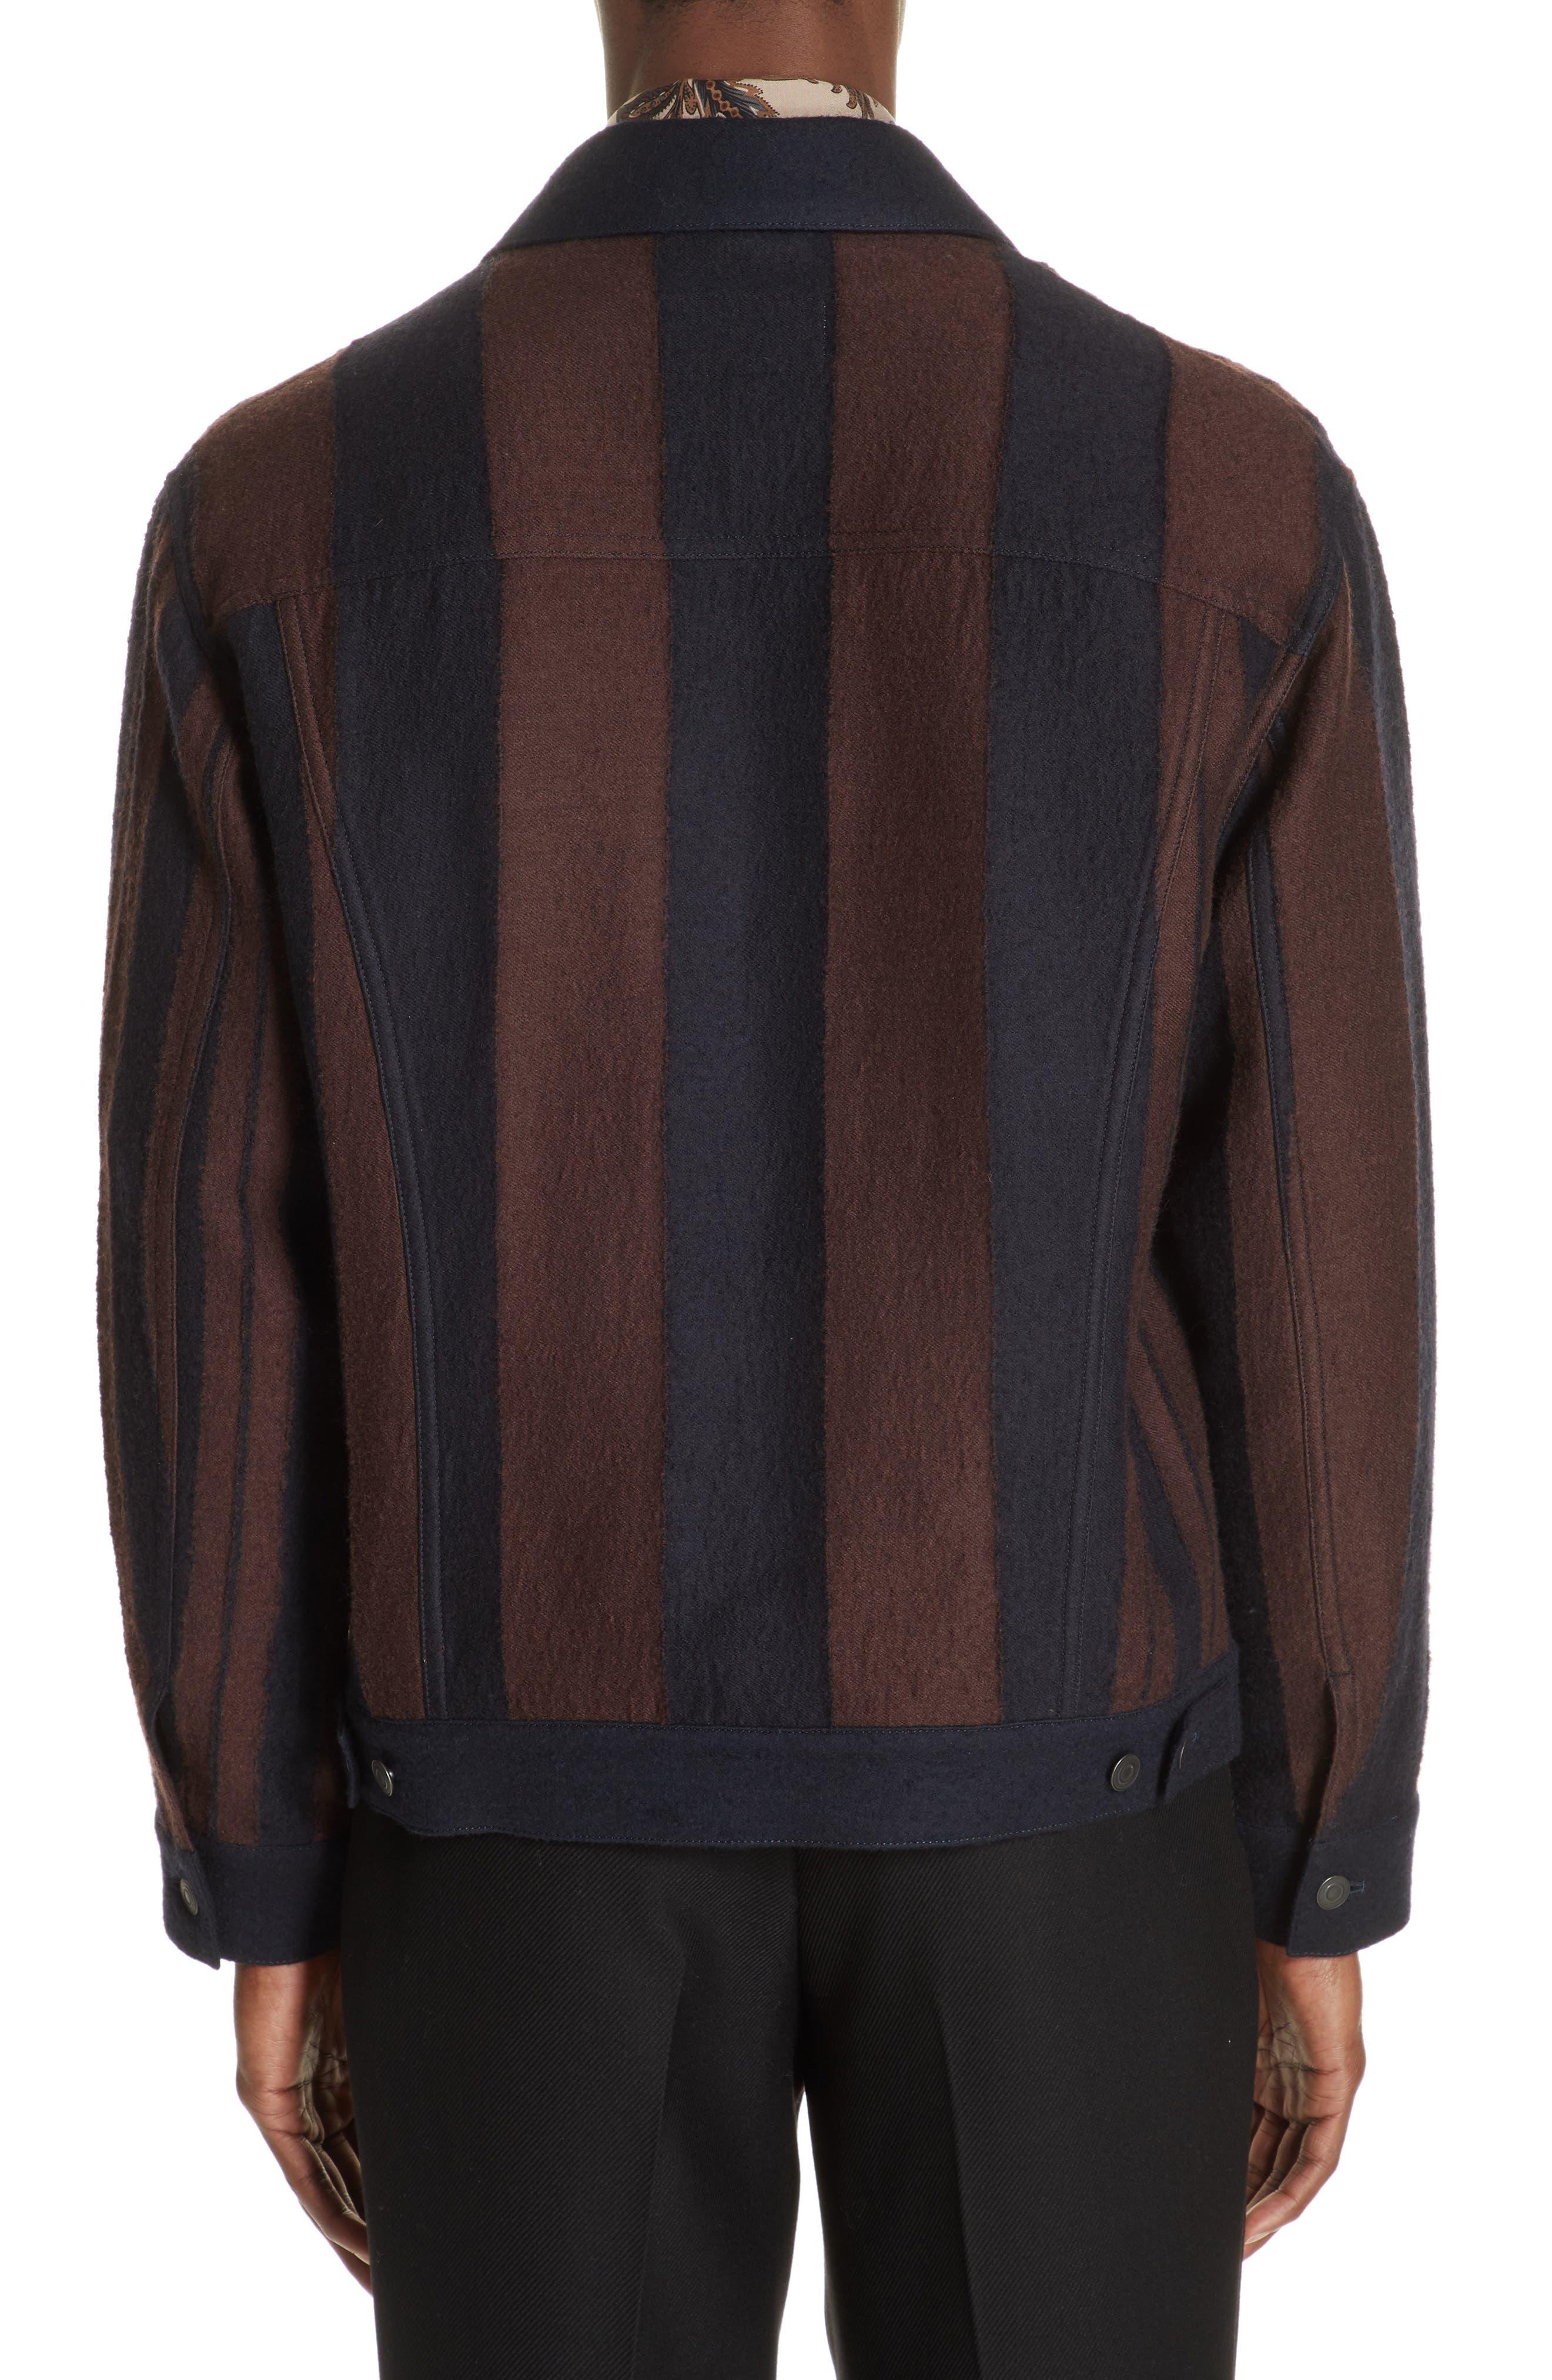 Stripe Wool Blend Jacket,                             Alternate thumbnail 2, color,                             001